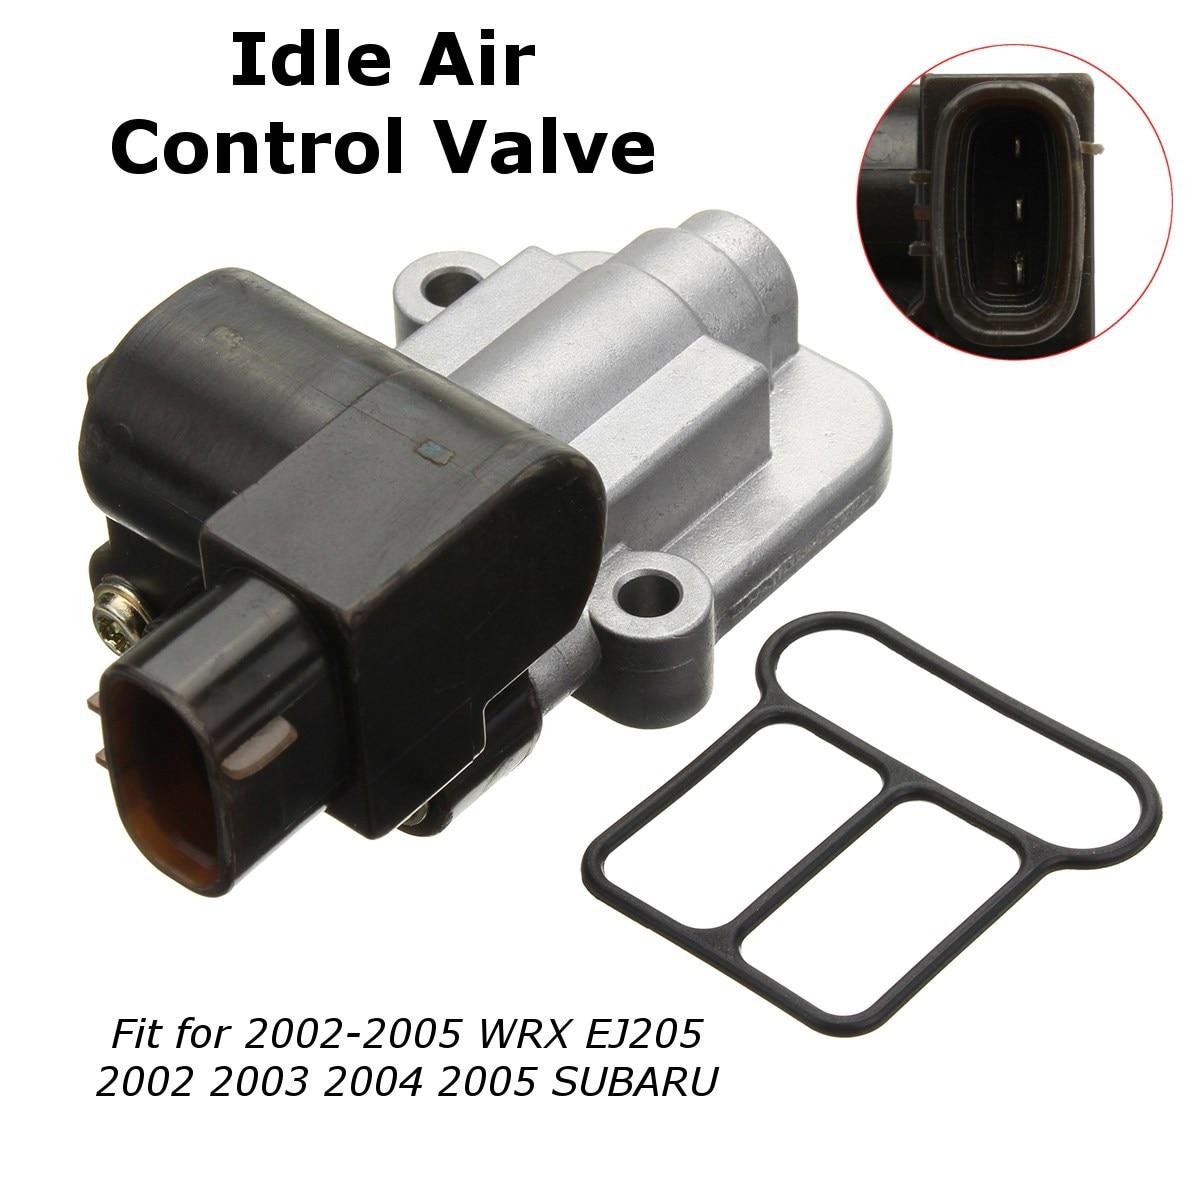 Idle Air Control Valve IACV IAC 22650AA181 For Subaru 2002-2005 WRX 2.0 EJ205Idle Air Control Valve IACV IAC 22650AA181 For Subaru 2002-2005 WRX 2.0 EJ205